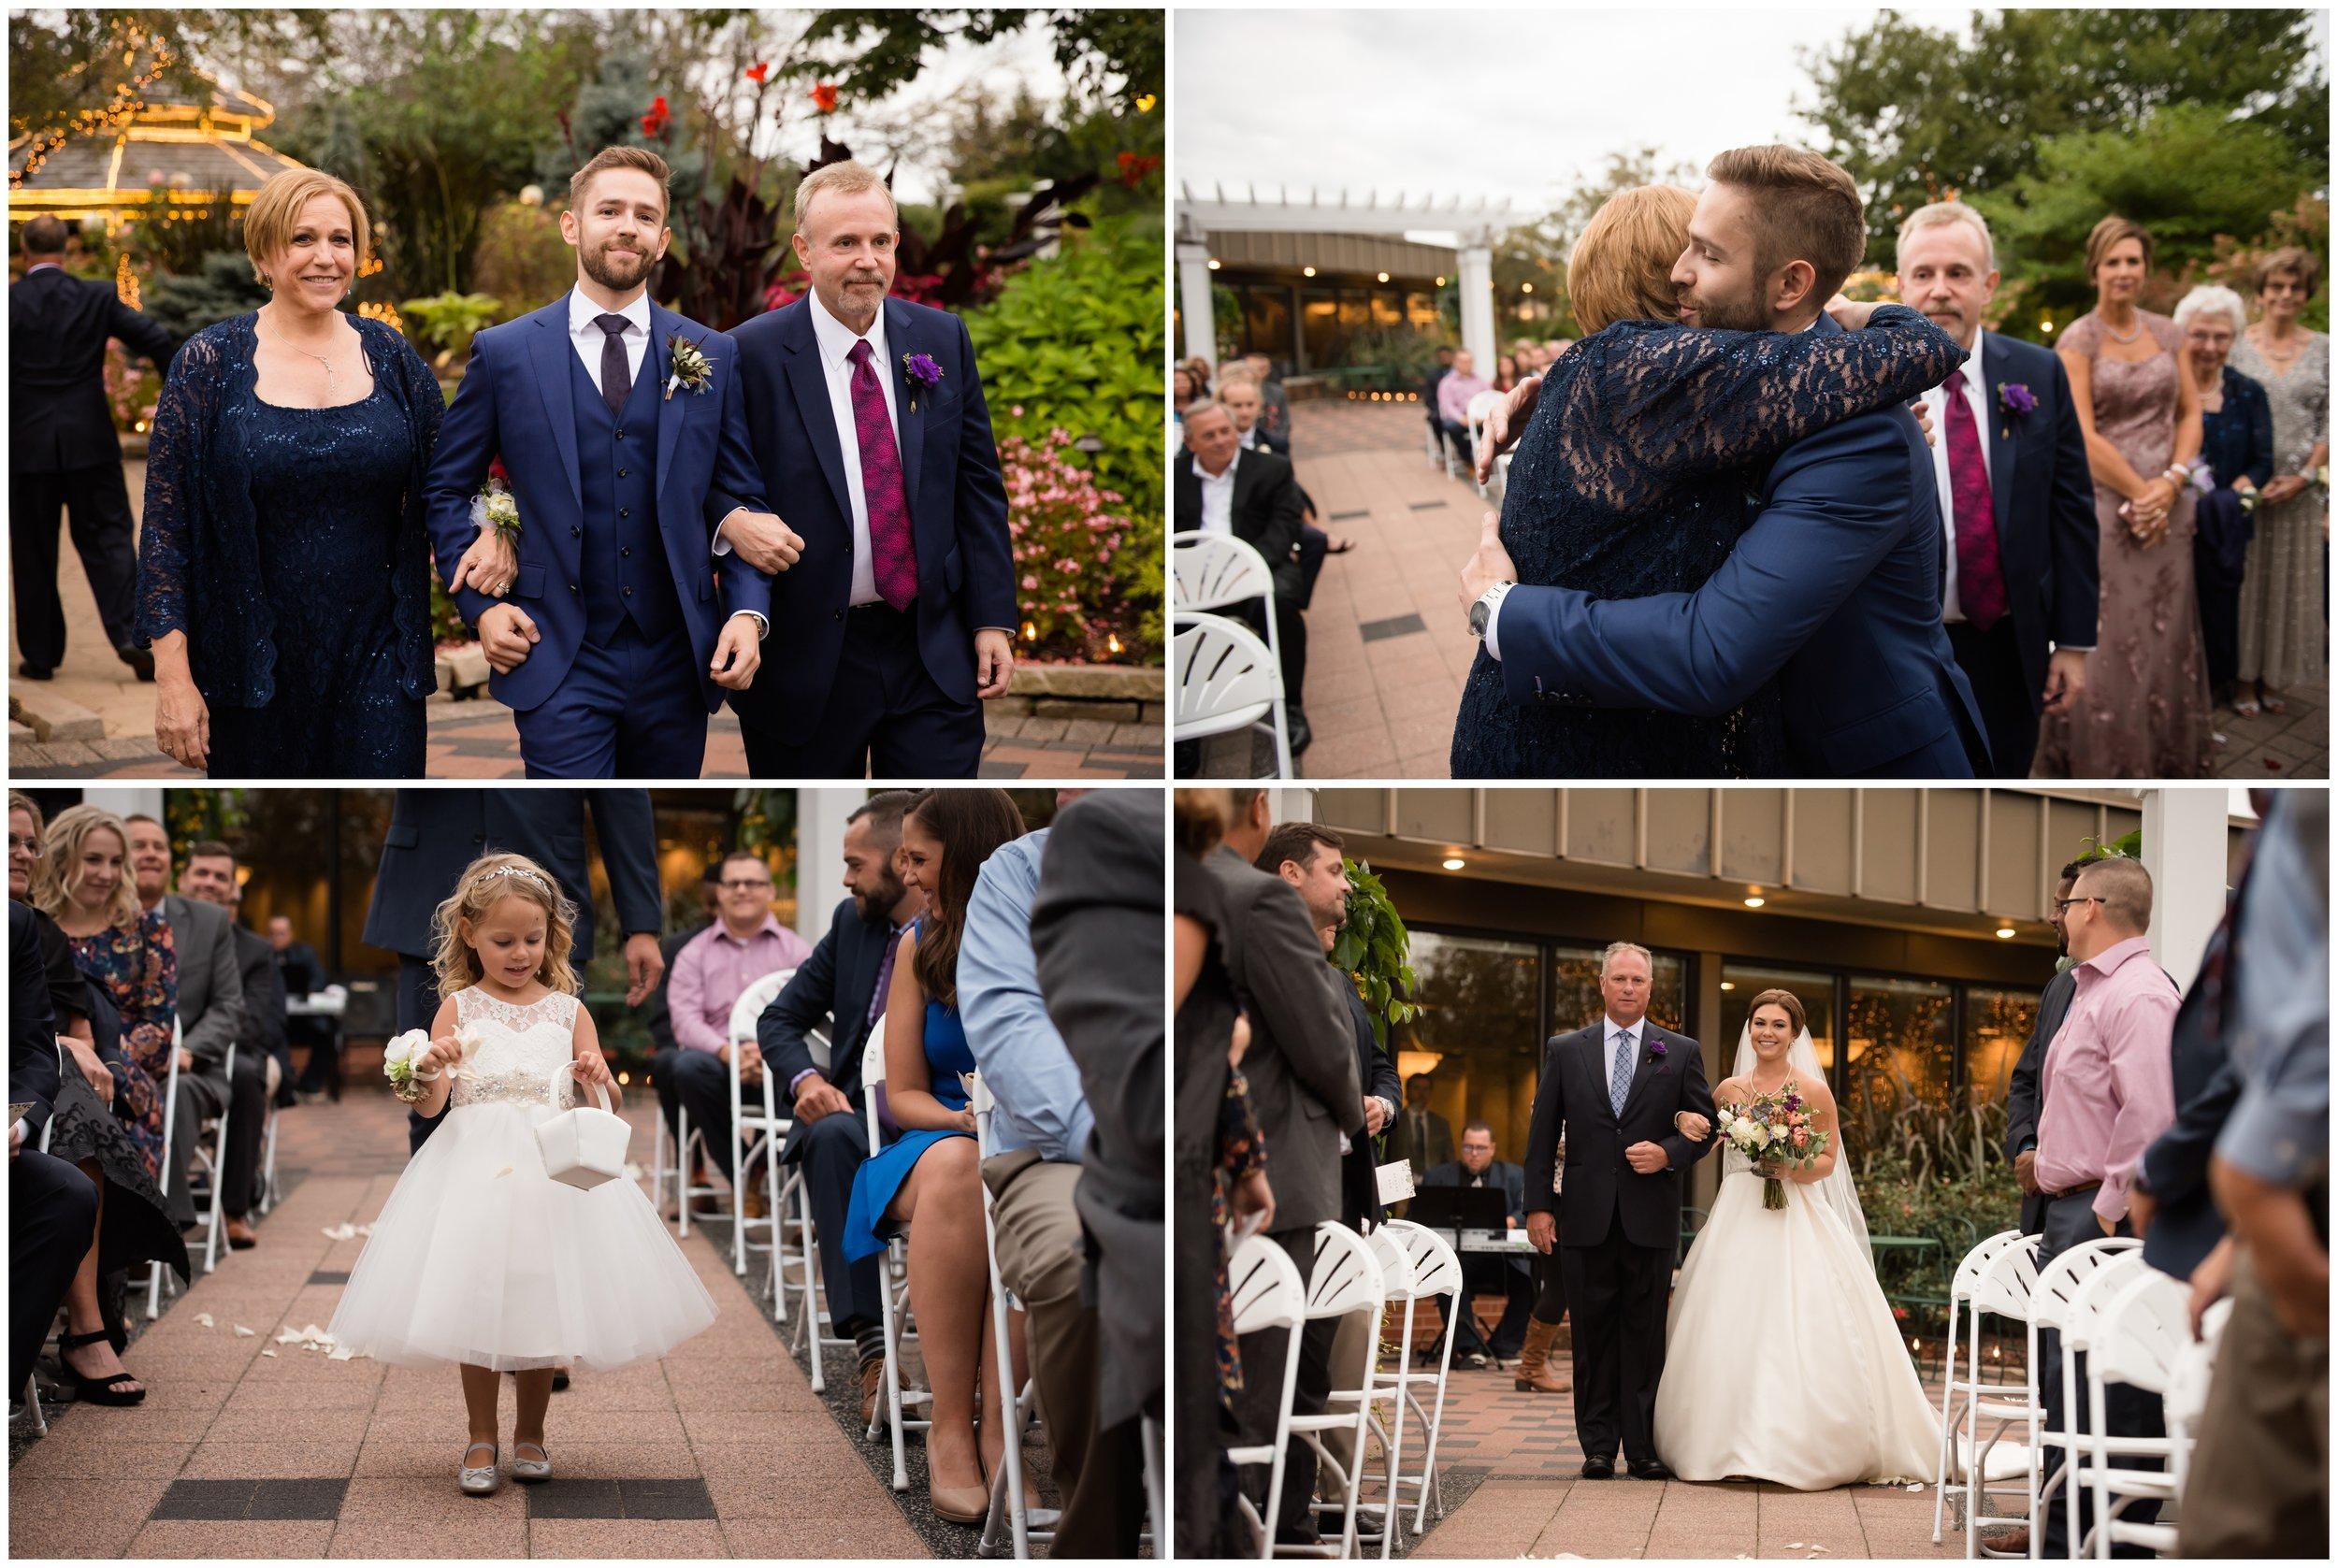 Silver Lake Country Club Wedding Ceremony